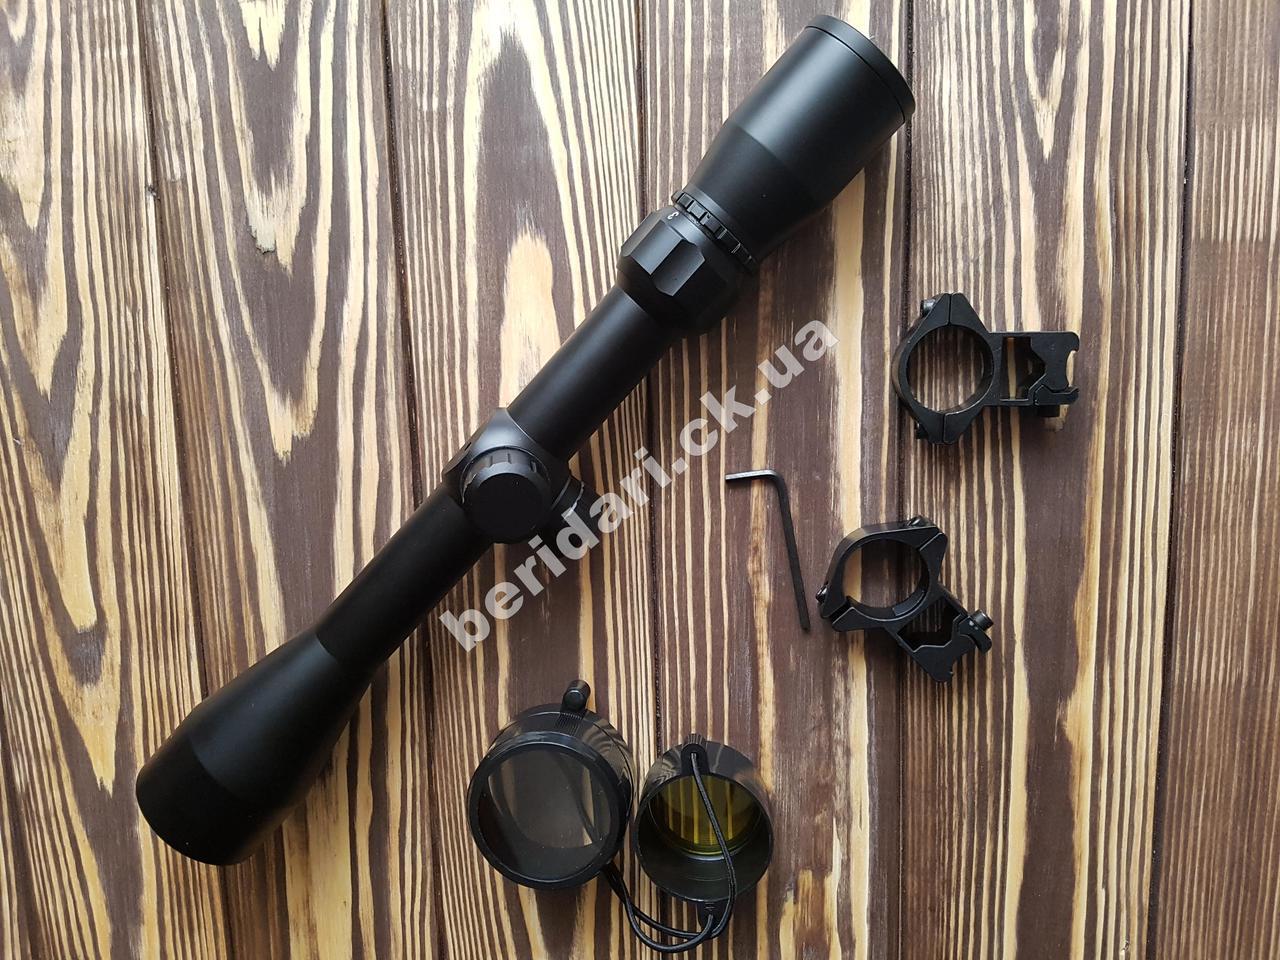 Оптический прицел Tasco 3-9x32